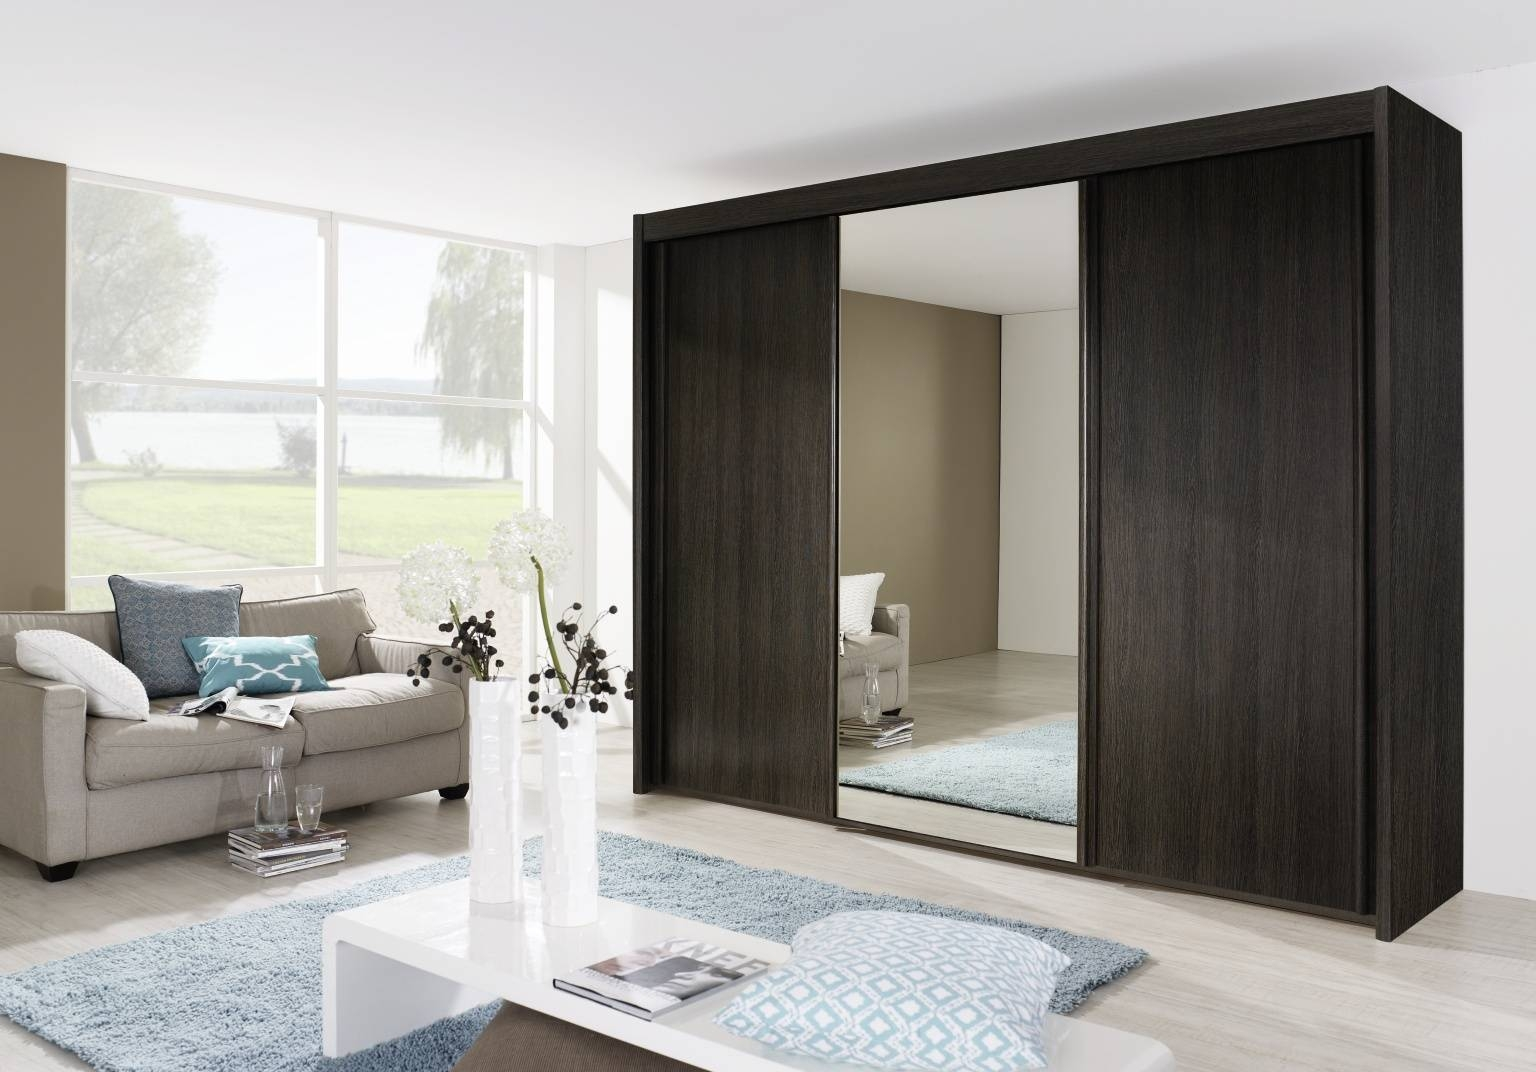 Rauch Imperial Sliding Wardrobe – Furniture Brothers Throughout Rauch Imperial Wardrobes (View 10 of 15)